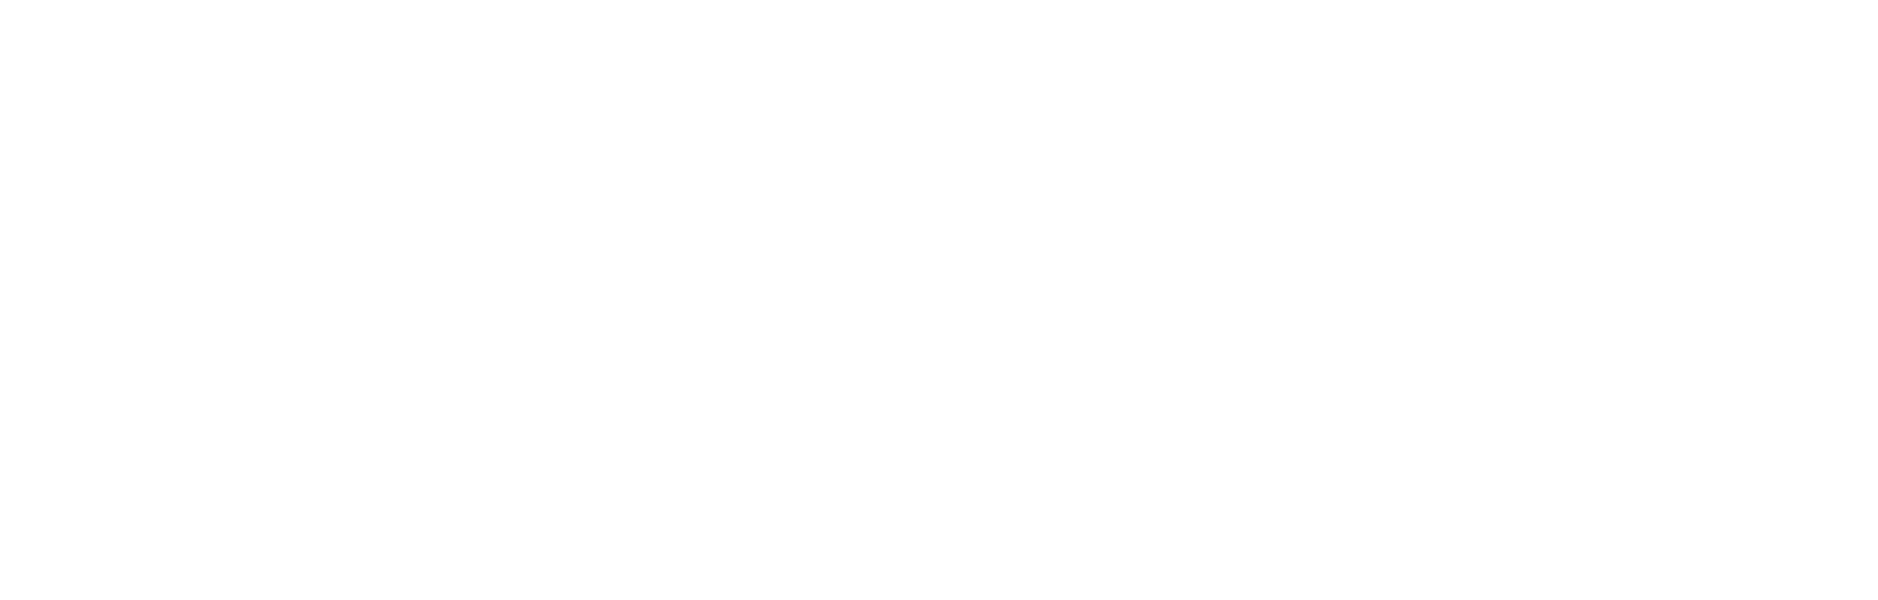 DodgeBow 757